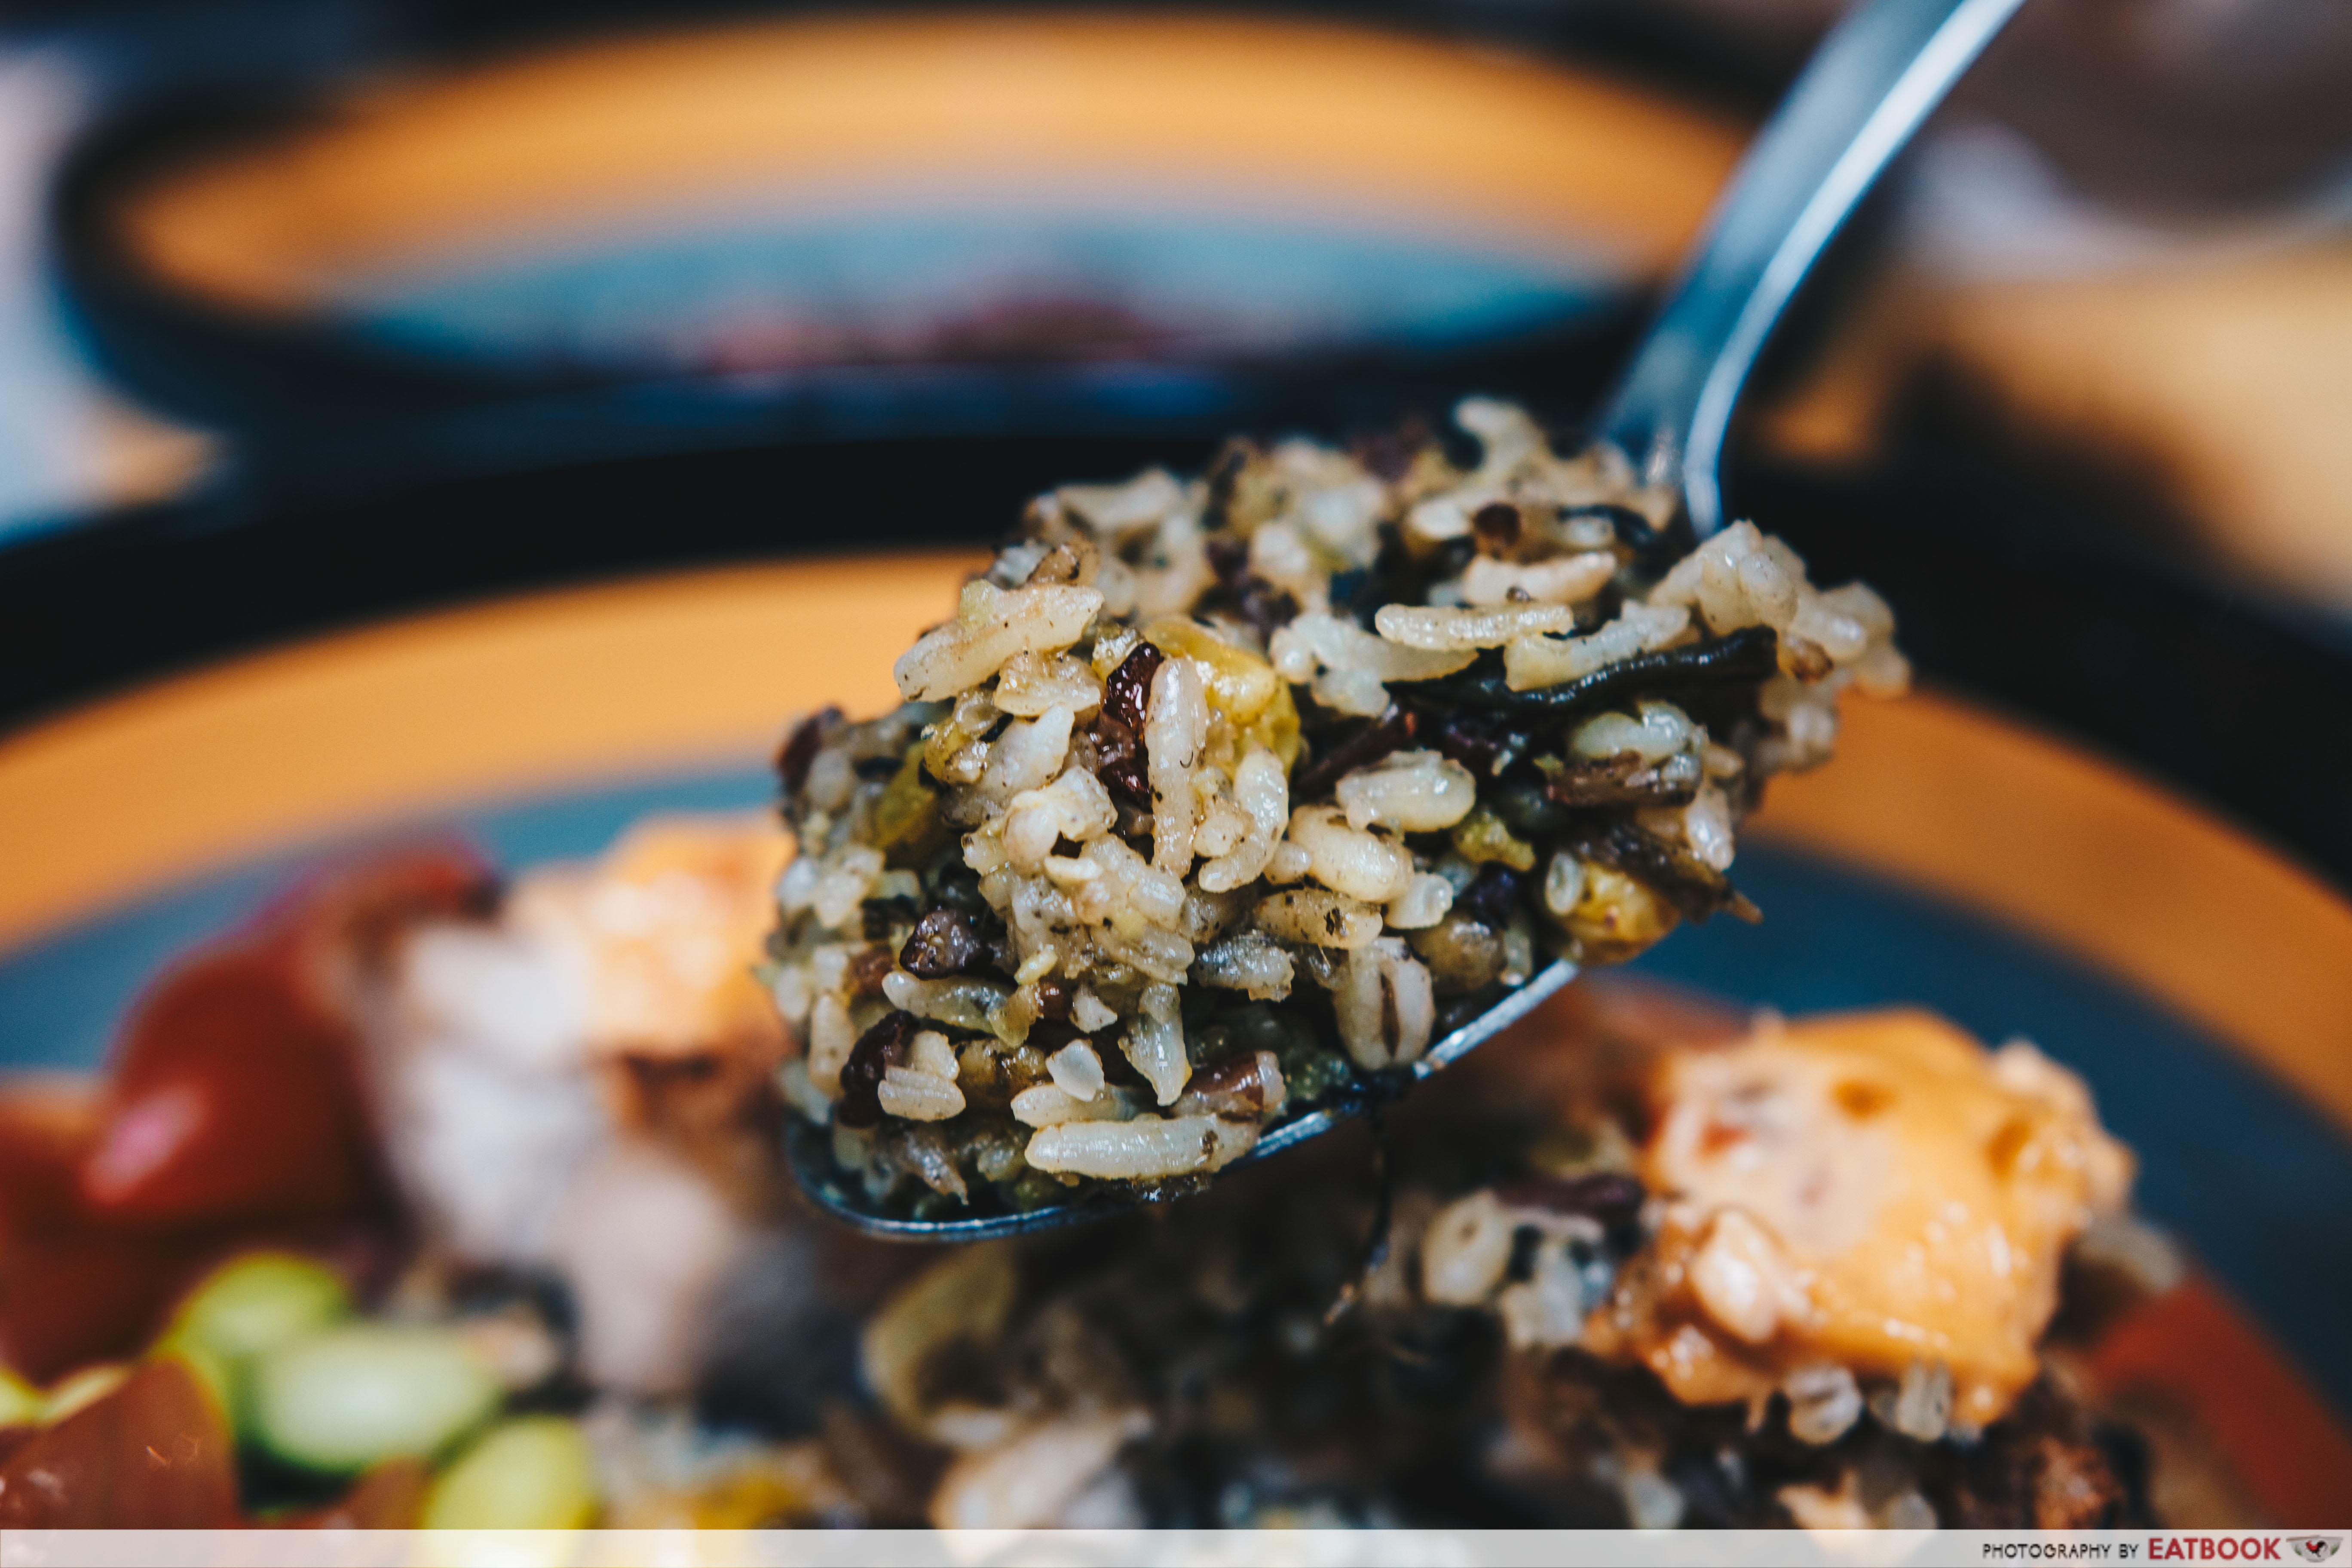 Garang Grill - olive grain rice